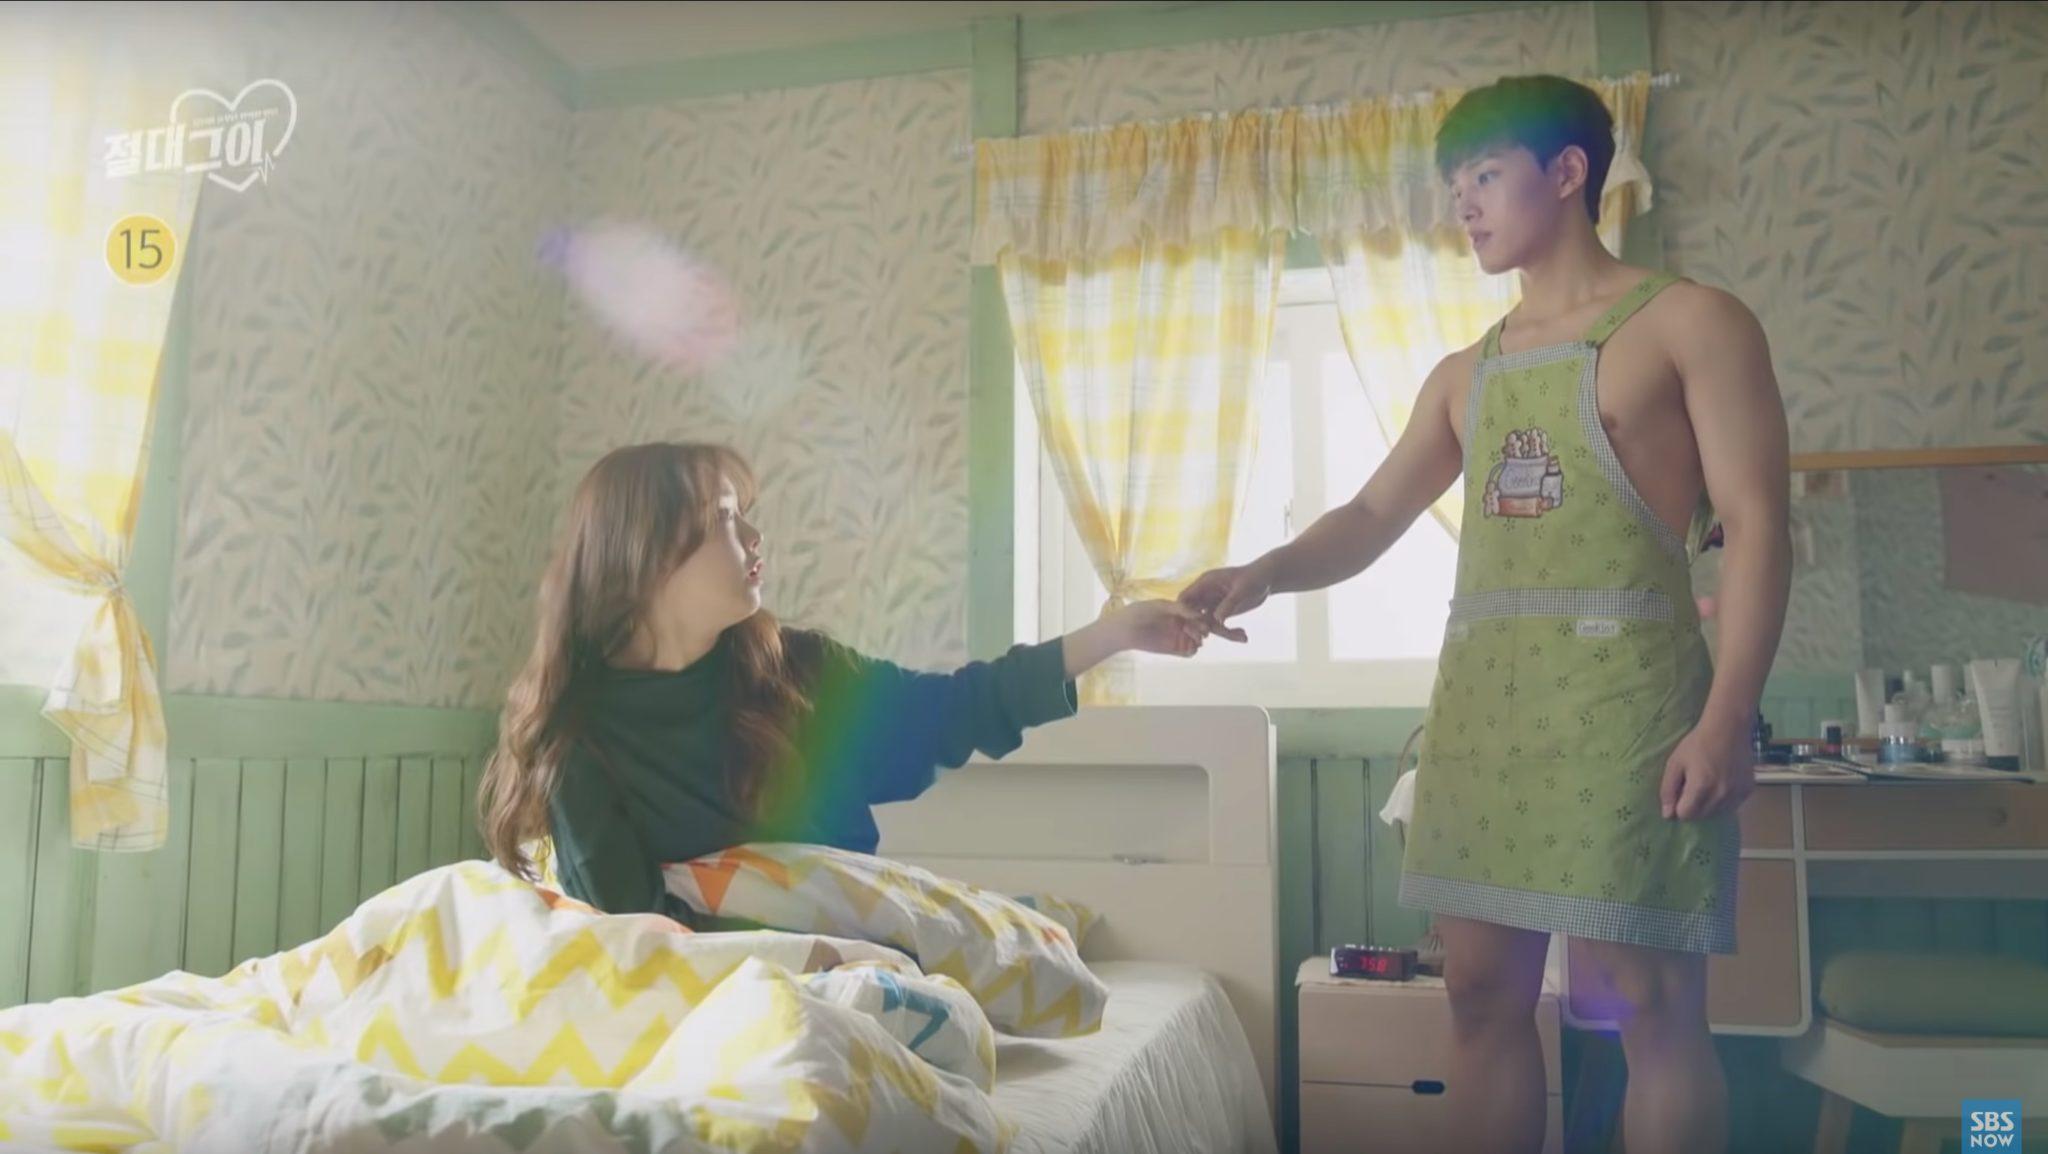 Yeo Jin-gu transforms into Minah's Absolute Boyfriend